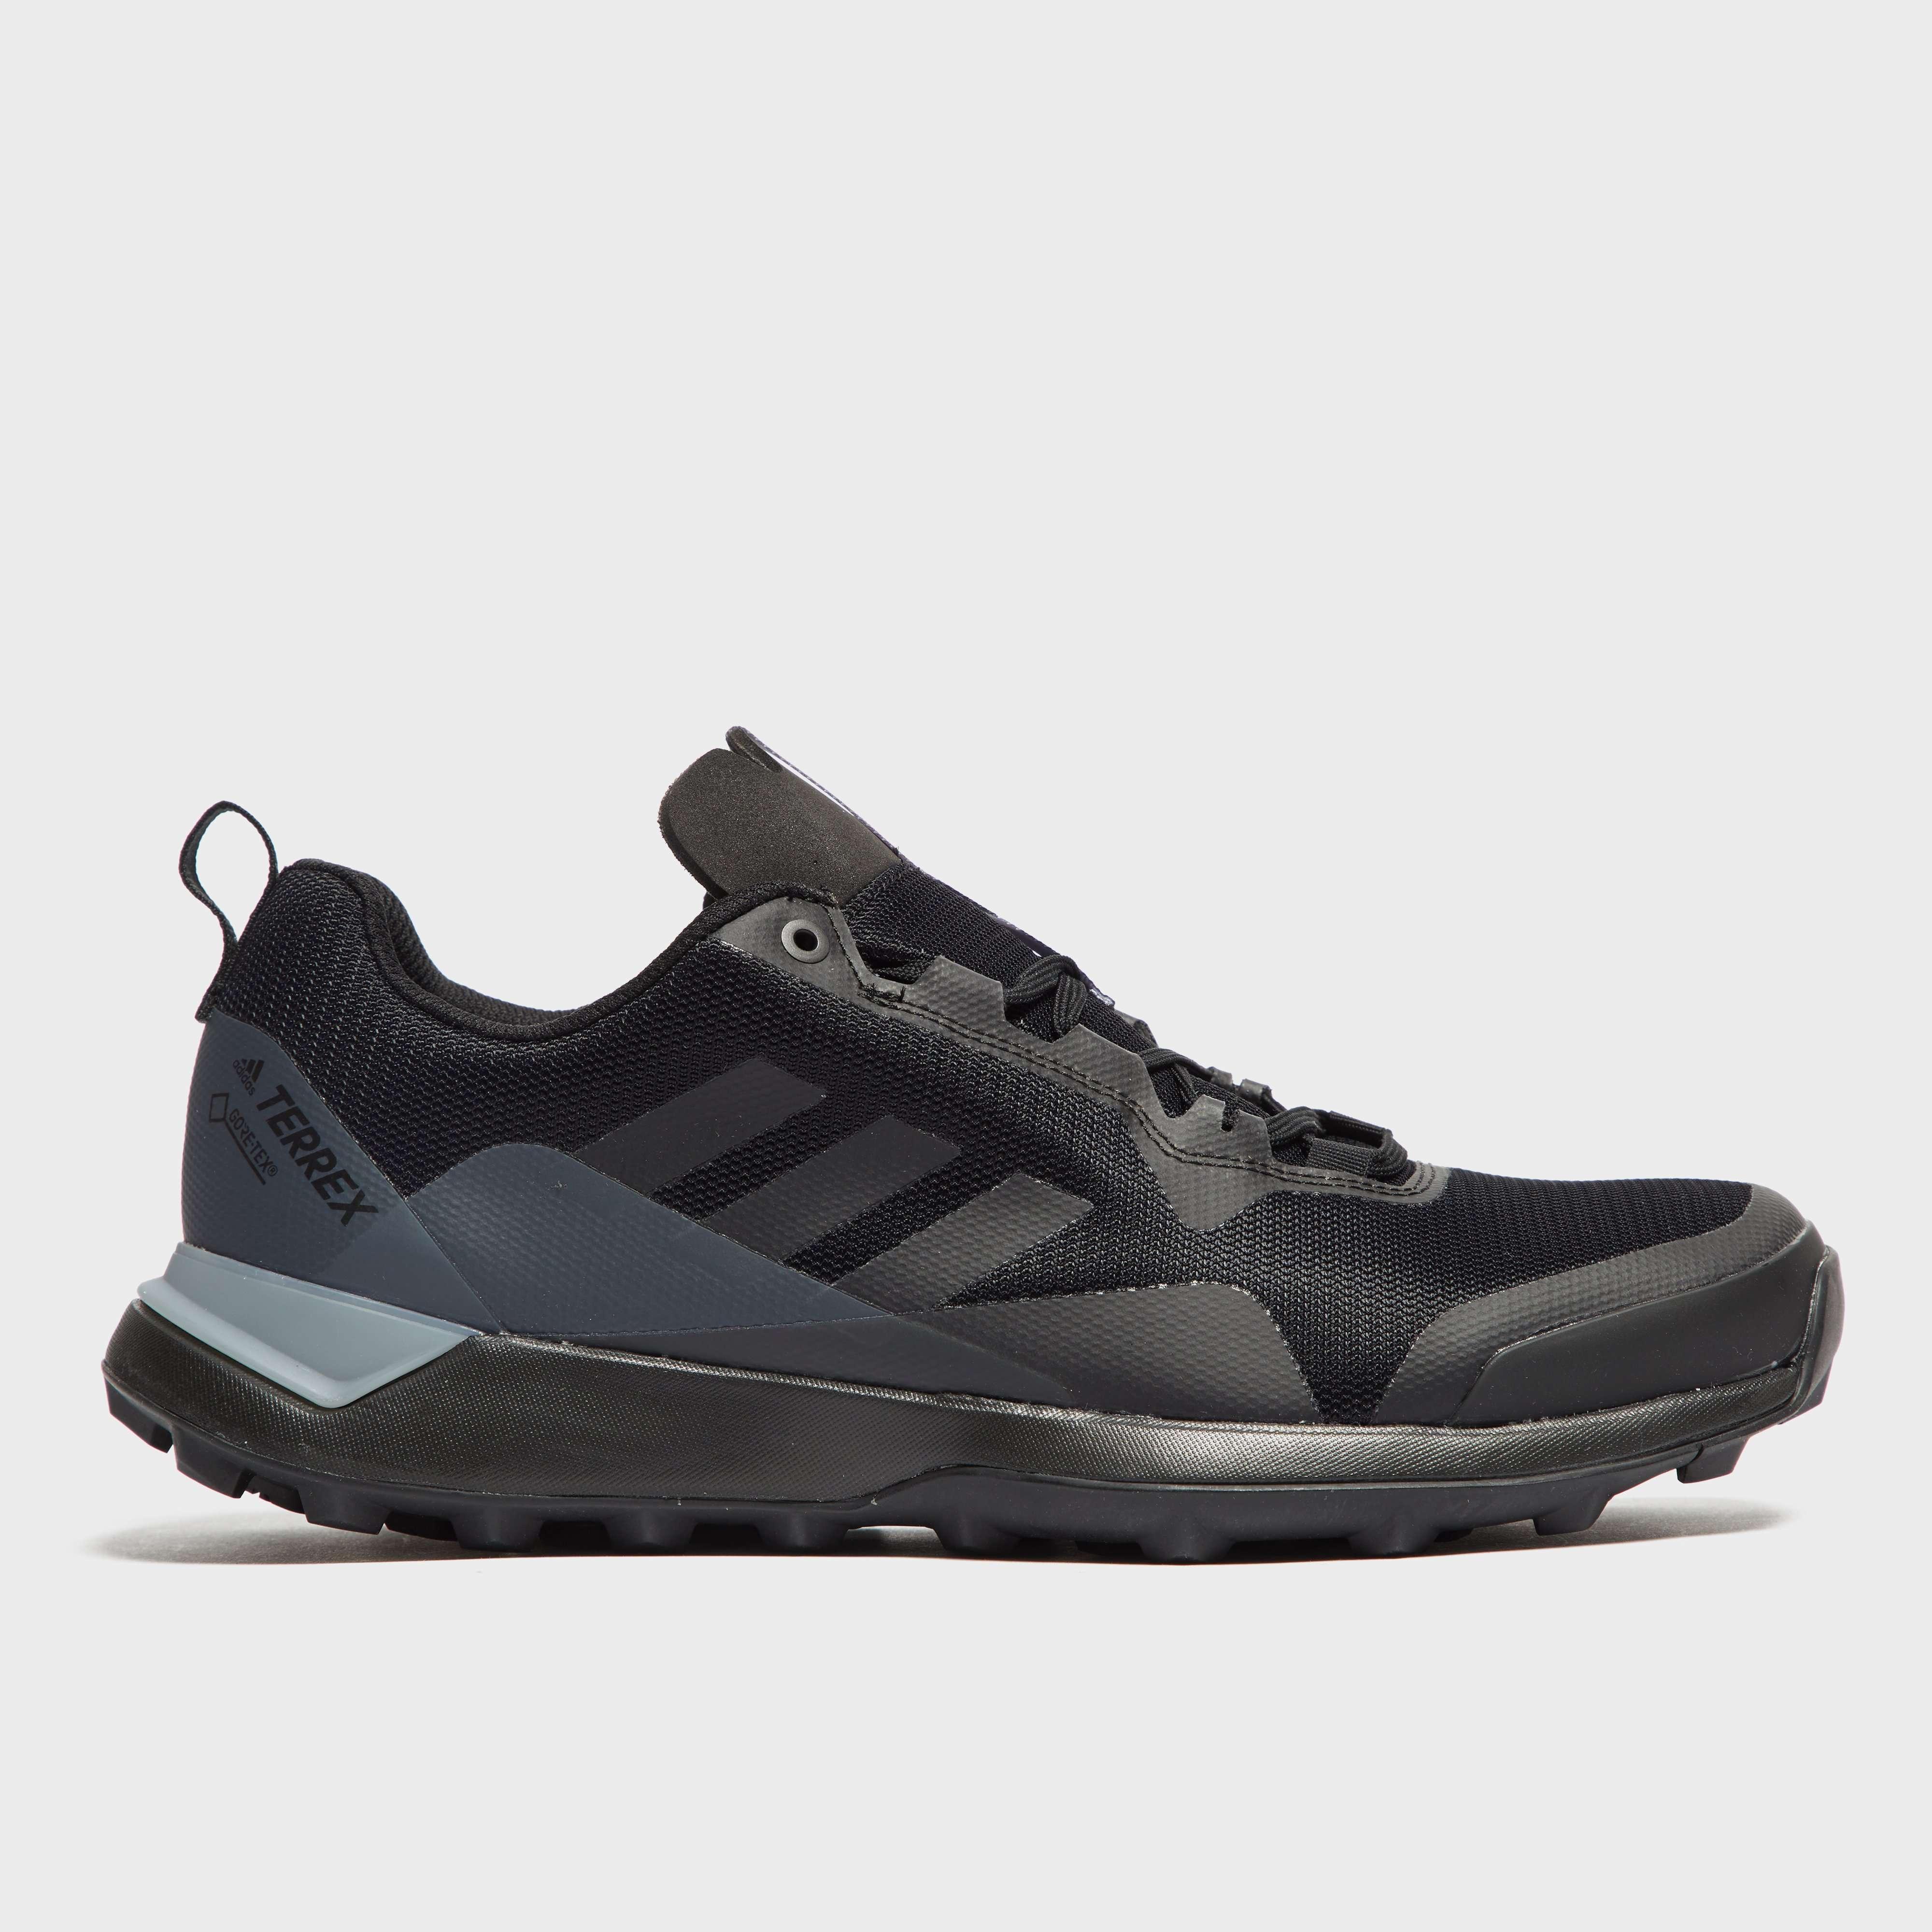 ADIDAS Men's Terrex CMTK GORE-TEX® Shoes